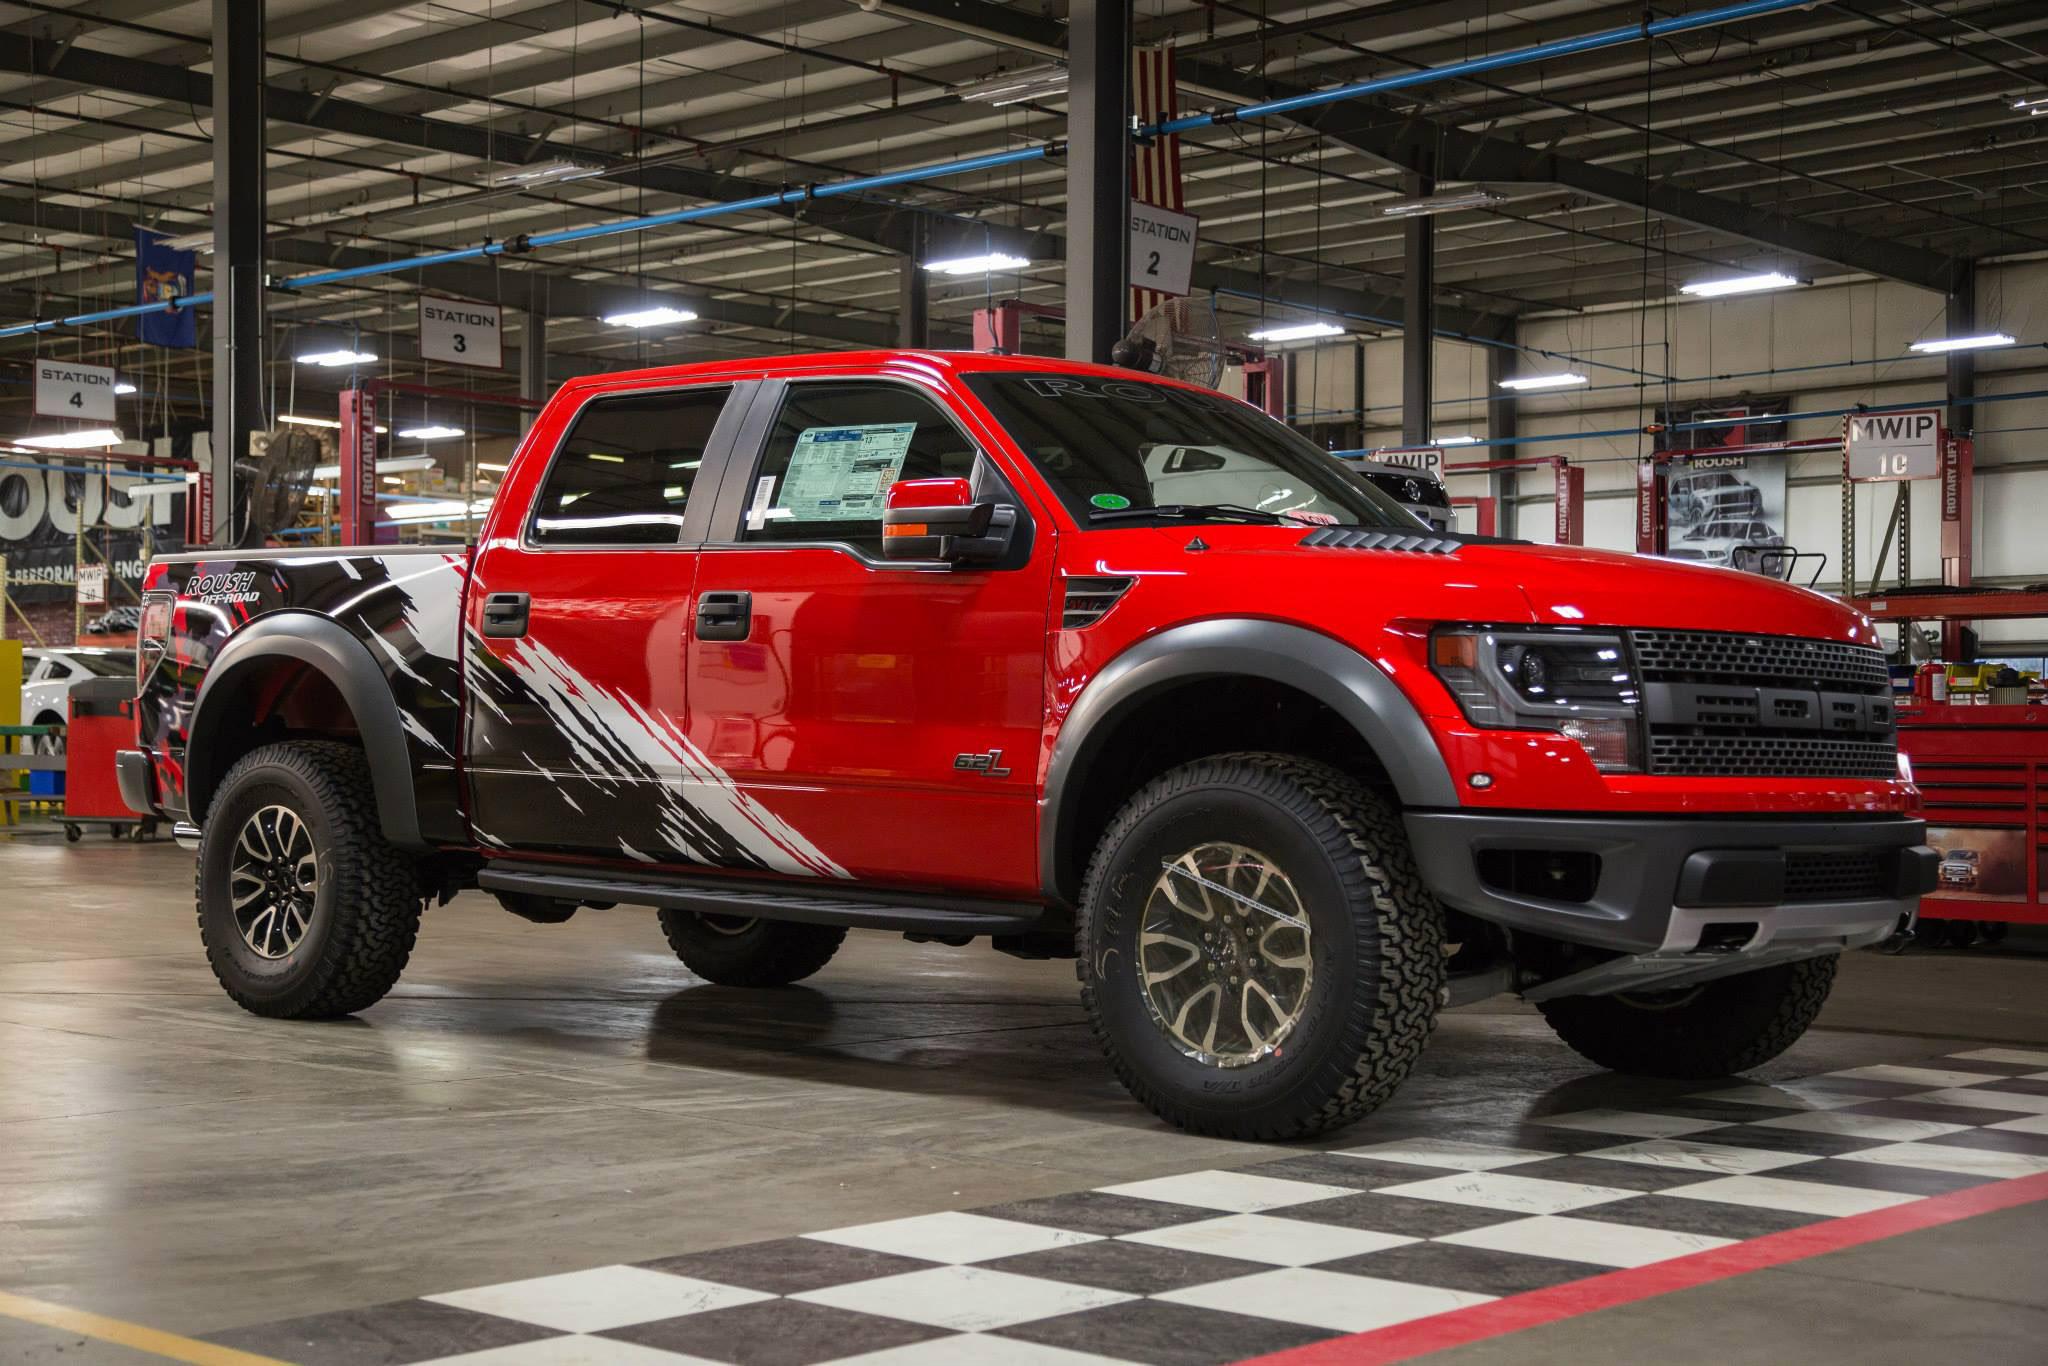 Ford Raptor Custom Camo 2014 roush off-road ford f-150